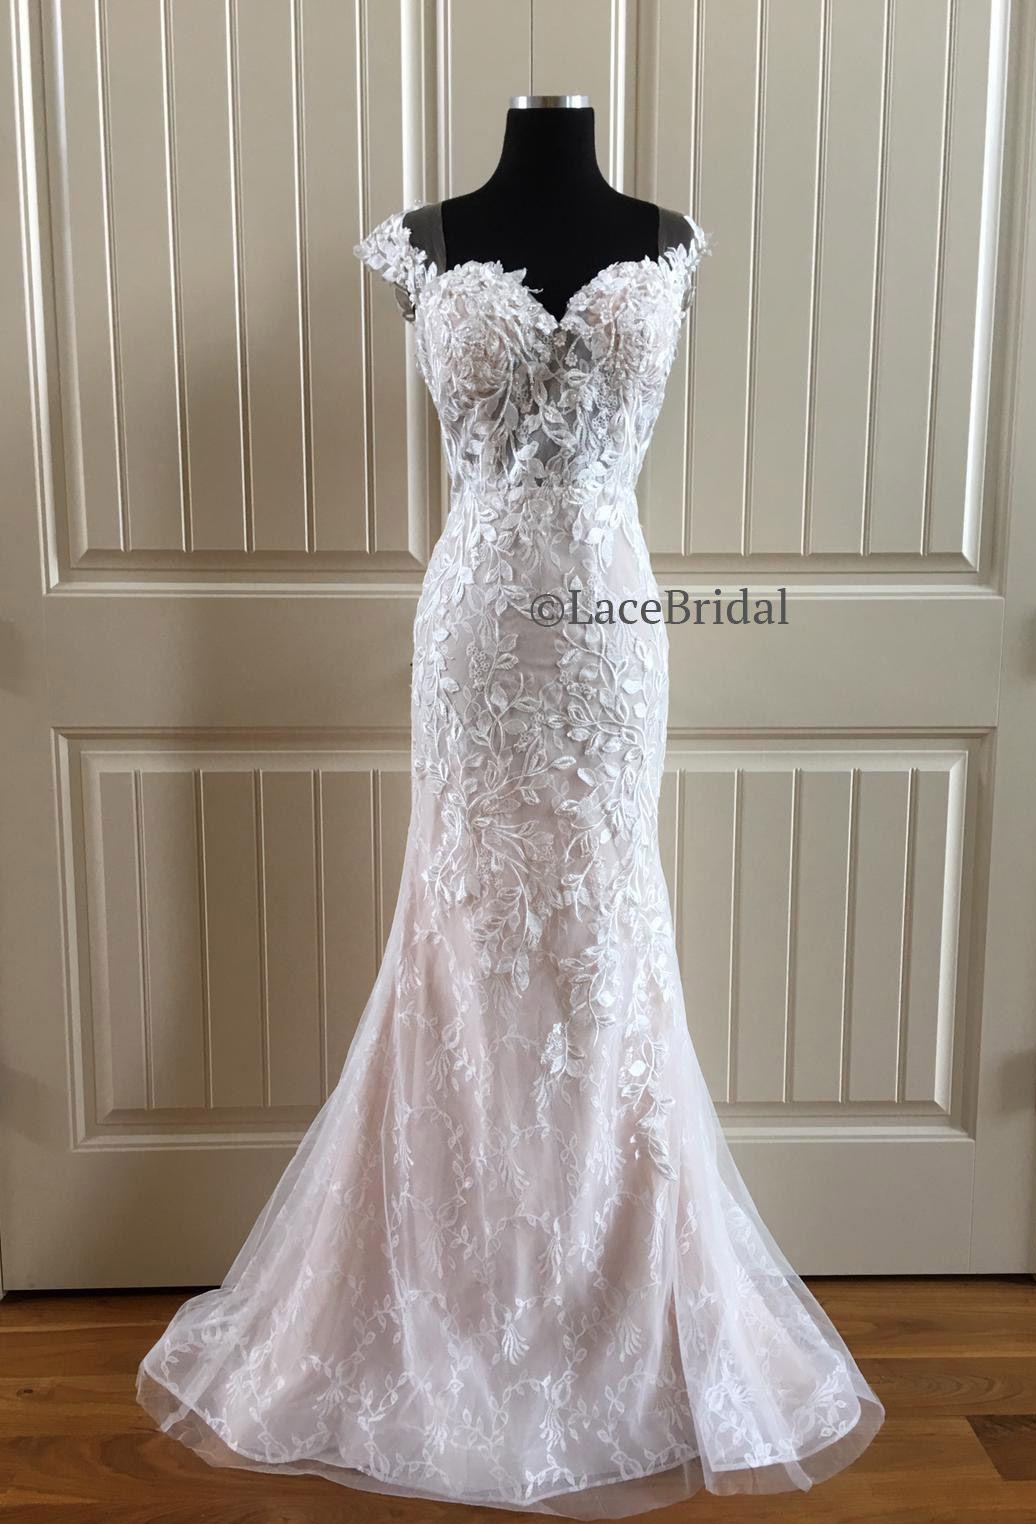 Naviblue Beatrice 18309 Wedding Dress New, Size 14